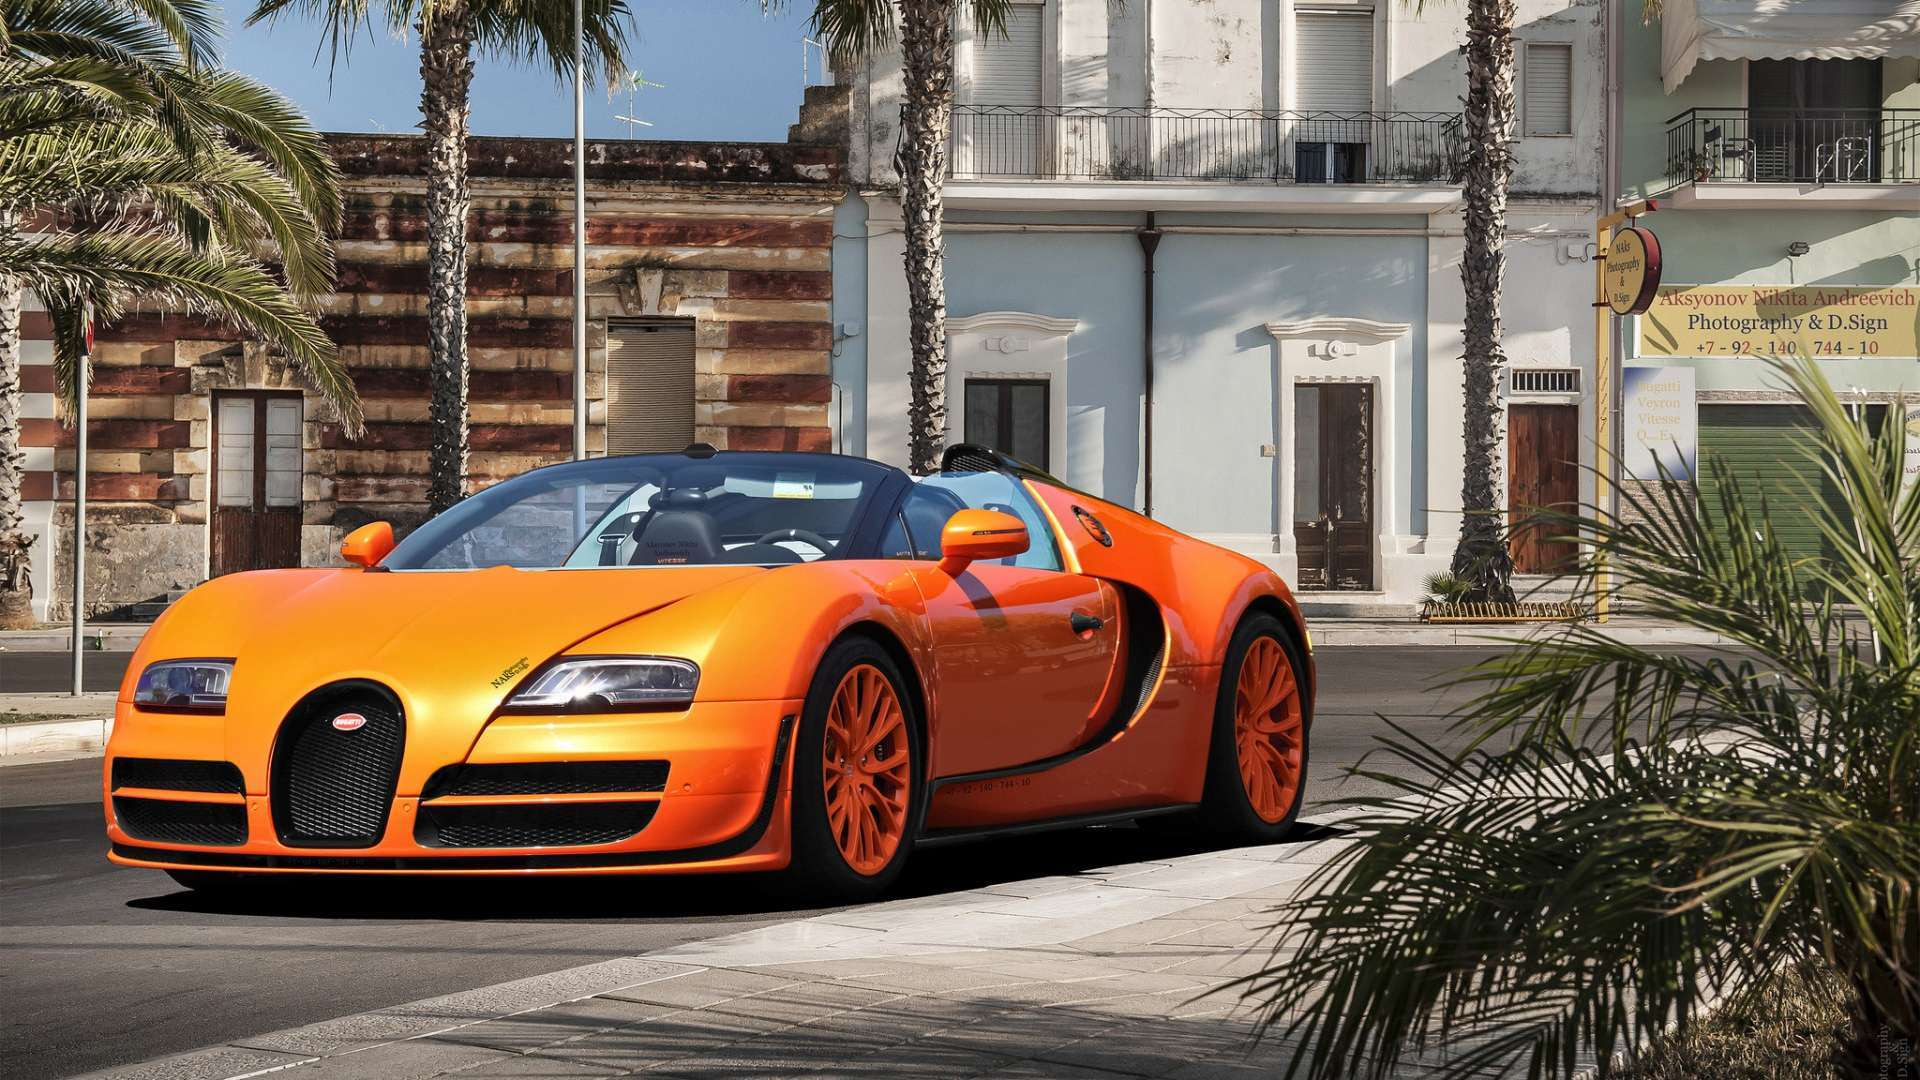 Bugatti Veyron Wallpaper for Desktop - WallpaperSafari